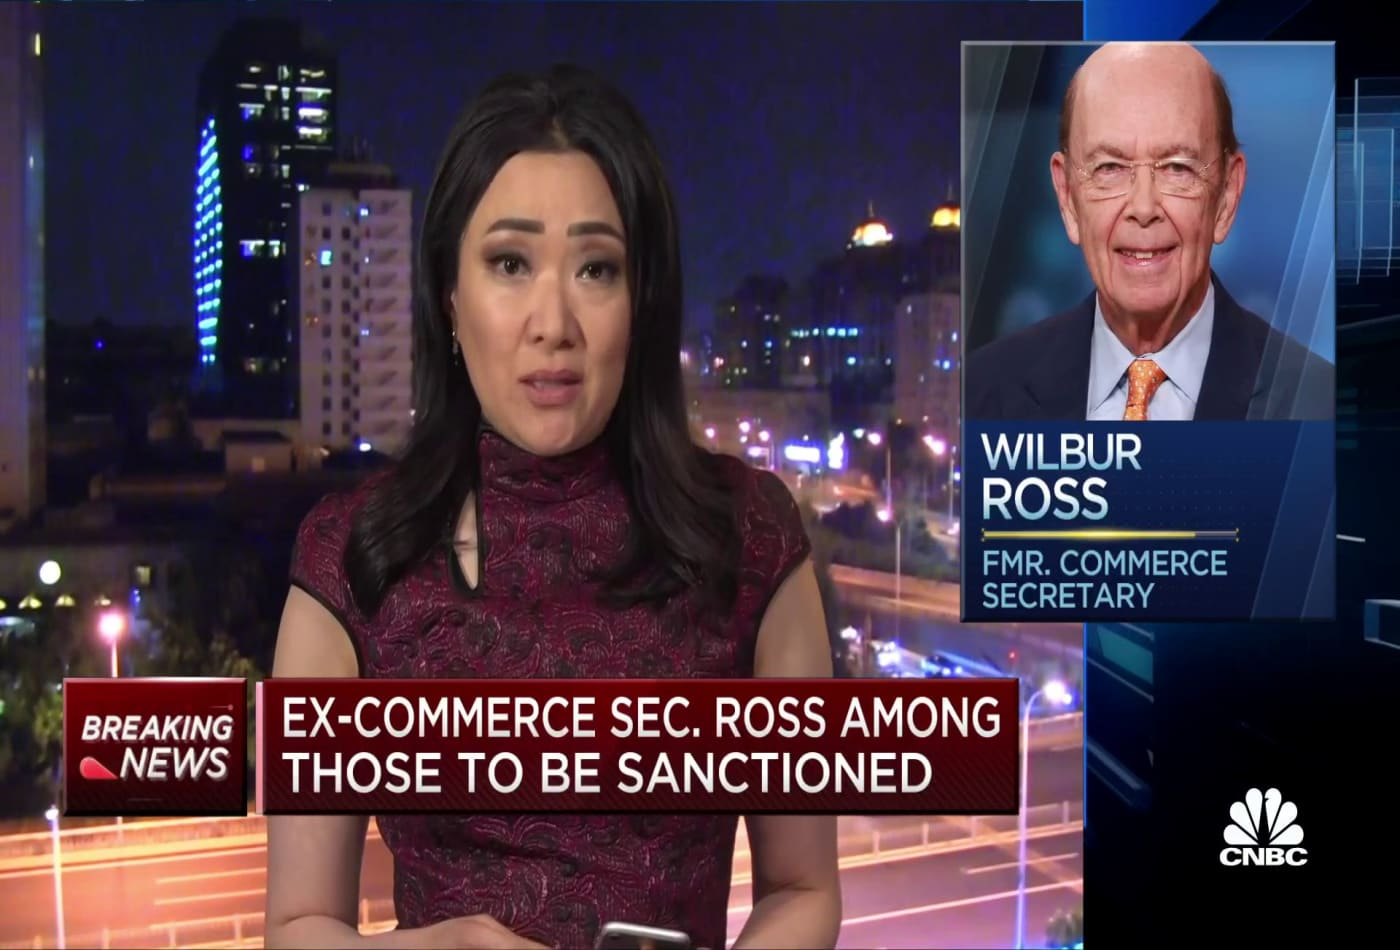 China announces sanctions against seven Americans, including former Commerce Secretary Wilbur Ross